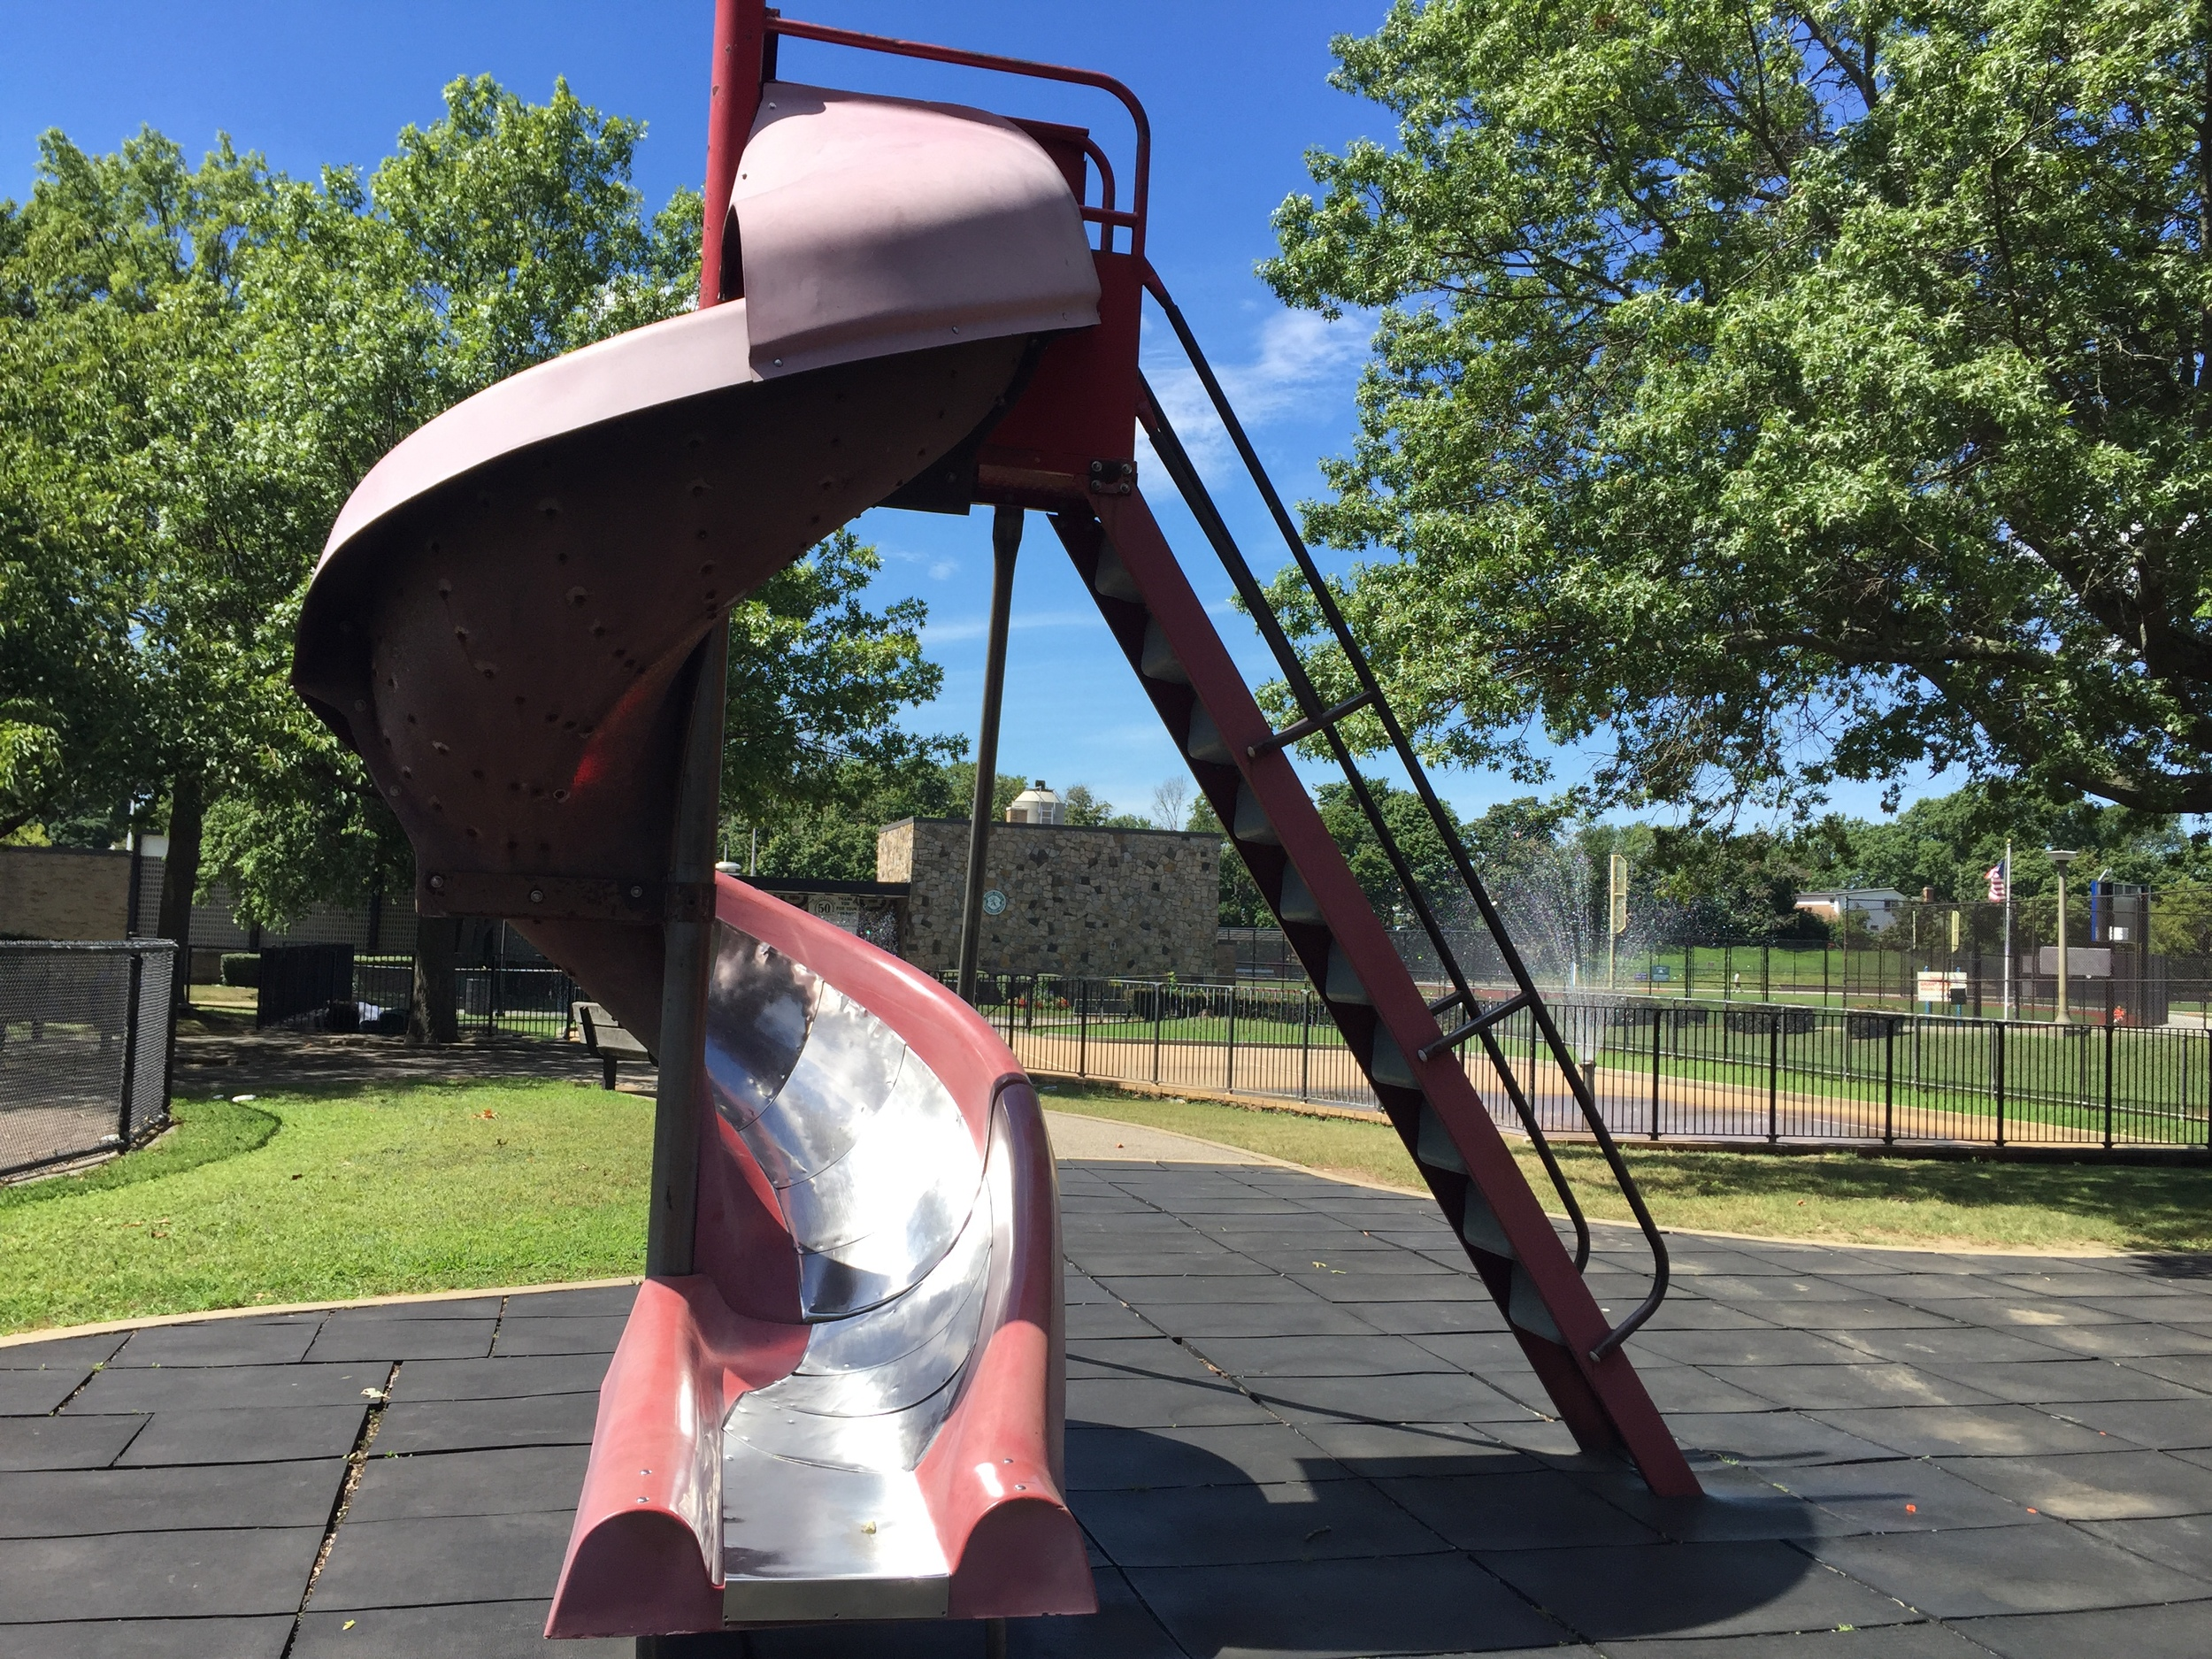 Slide at Grant Park